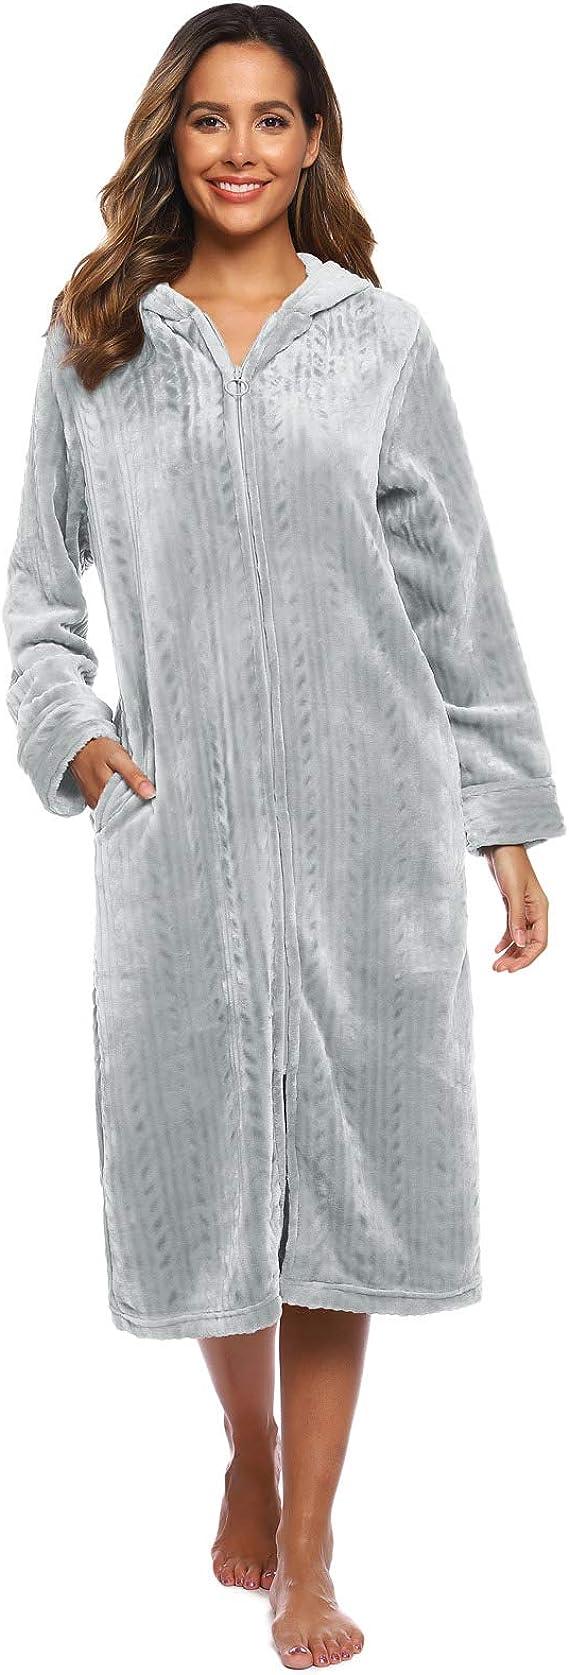 Zexxxy Peignoir Femmes Peignoir long Sauna Manteau Avec Capuche bindgürtel NEUF